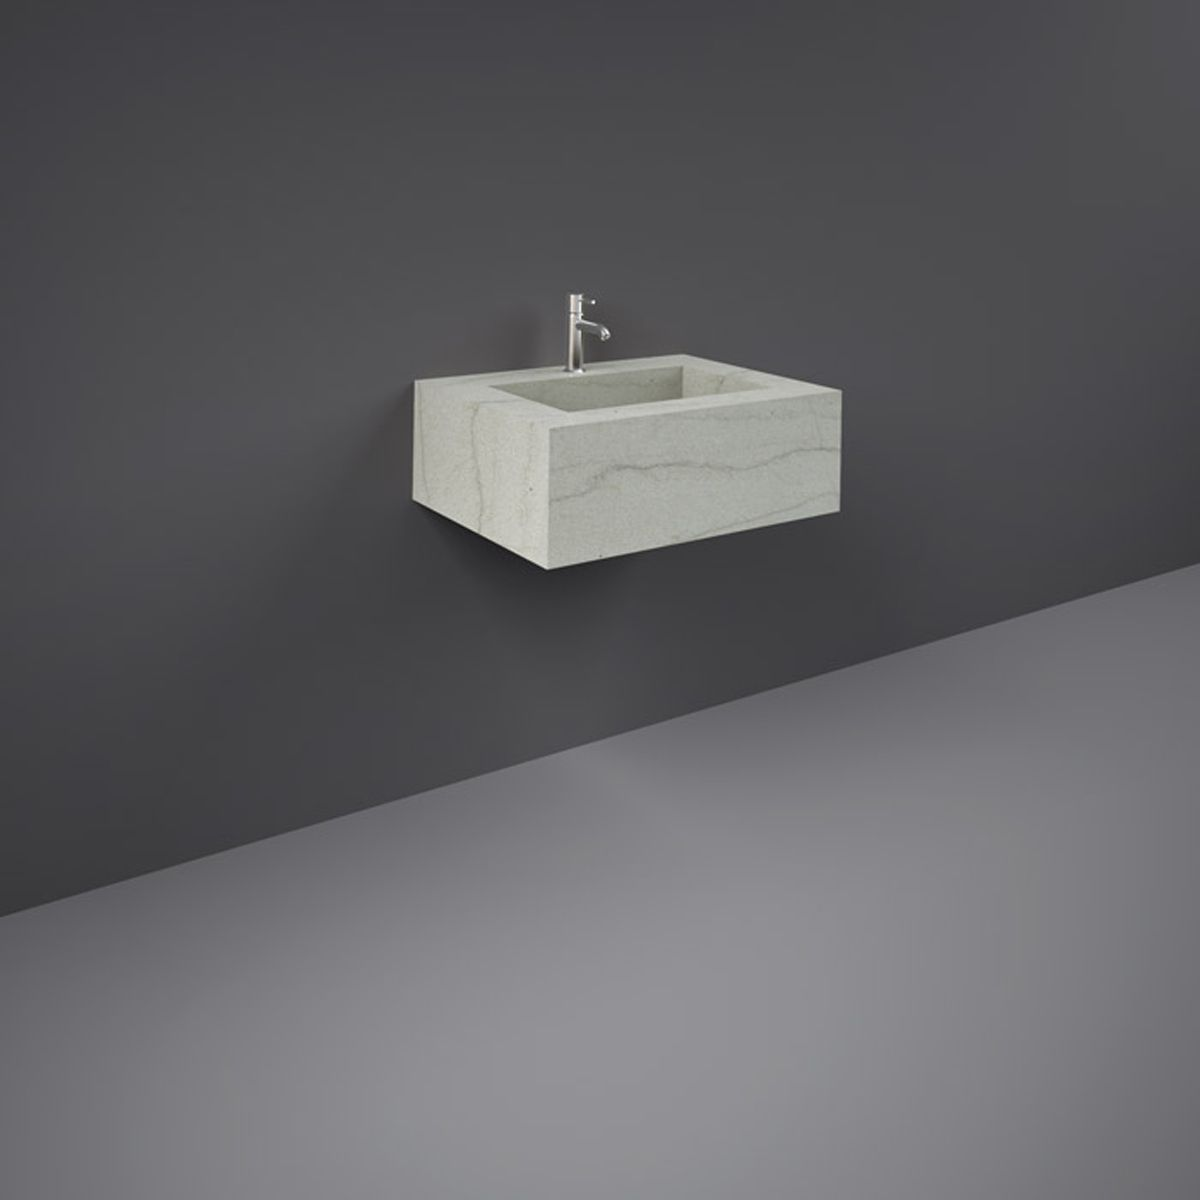 RAK Precious Macaubus Wall Hung Counter Basin with Bracket